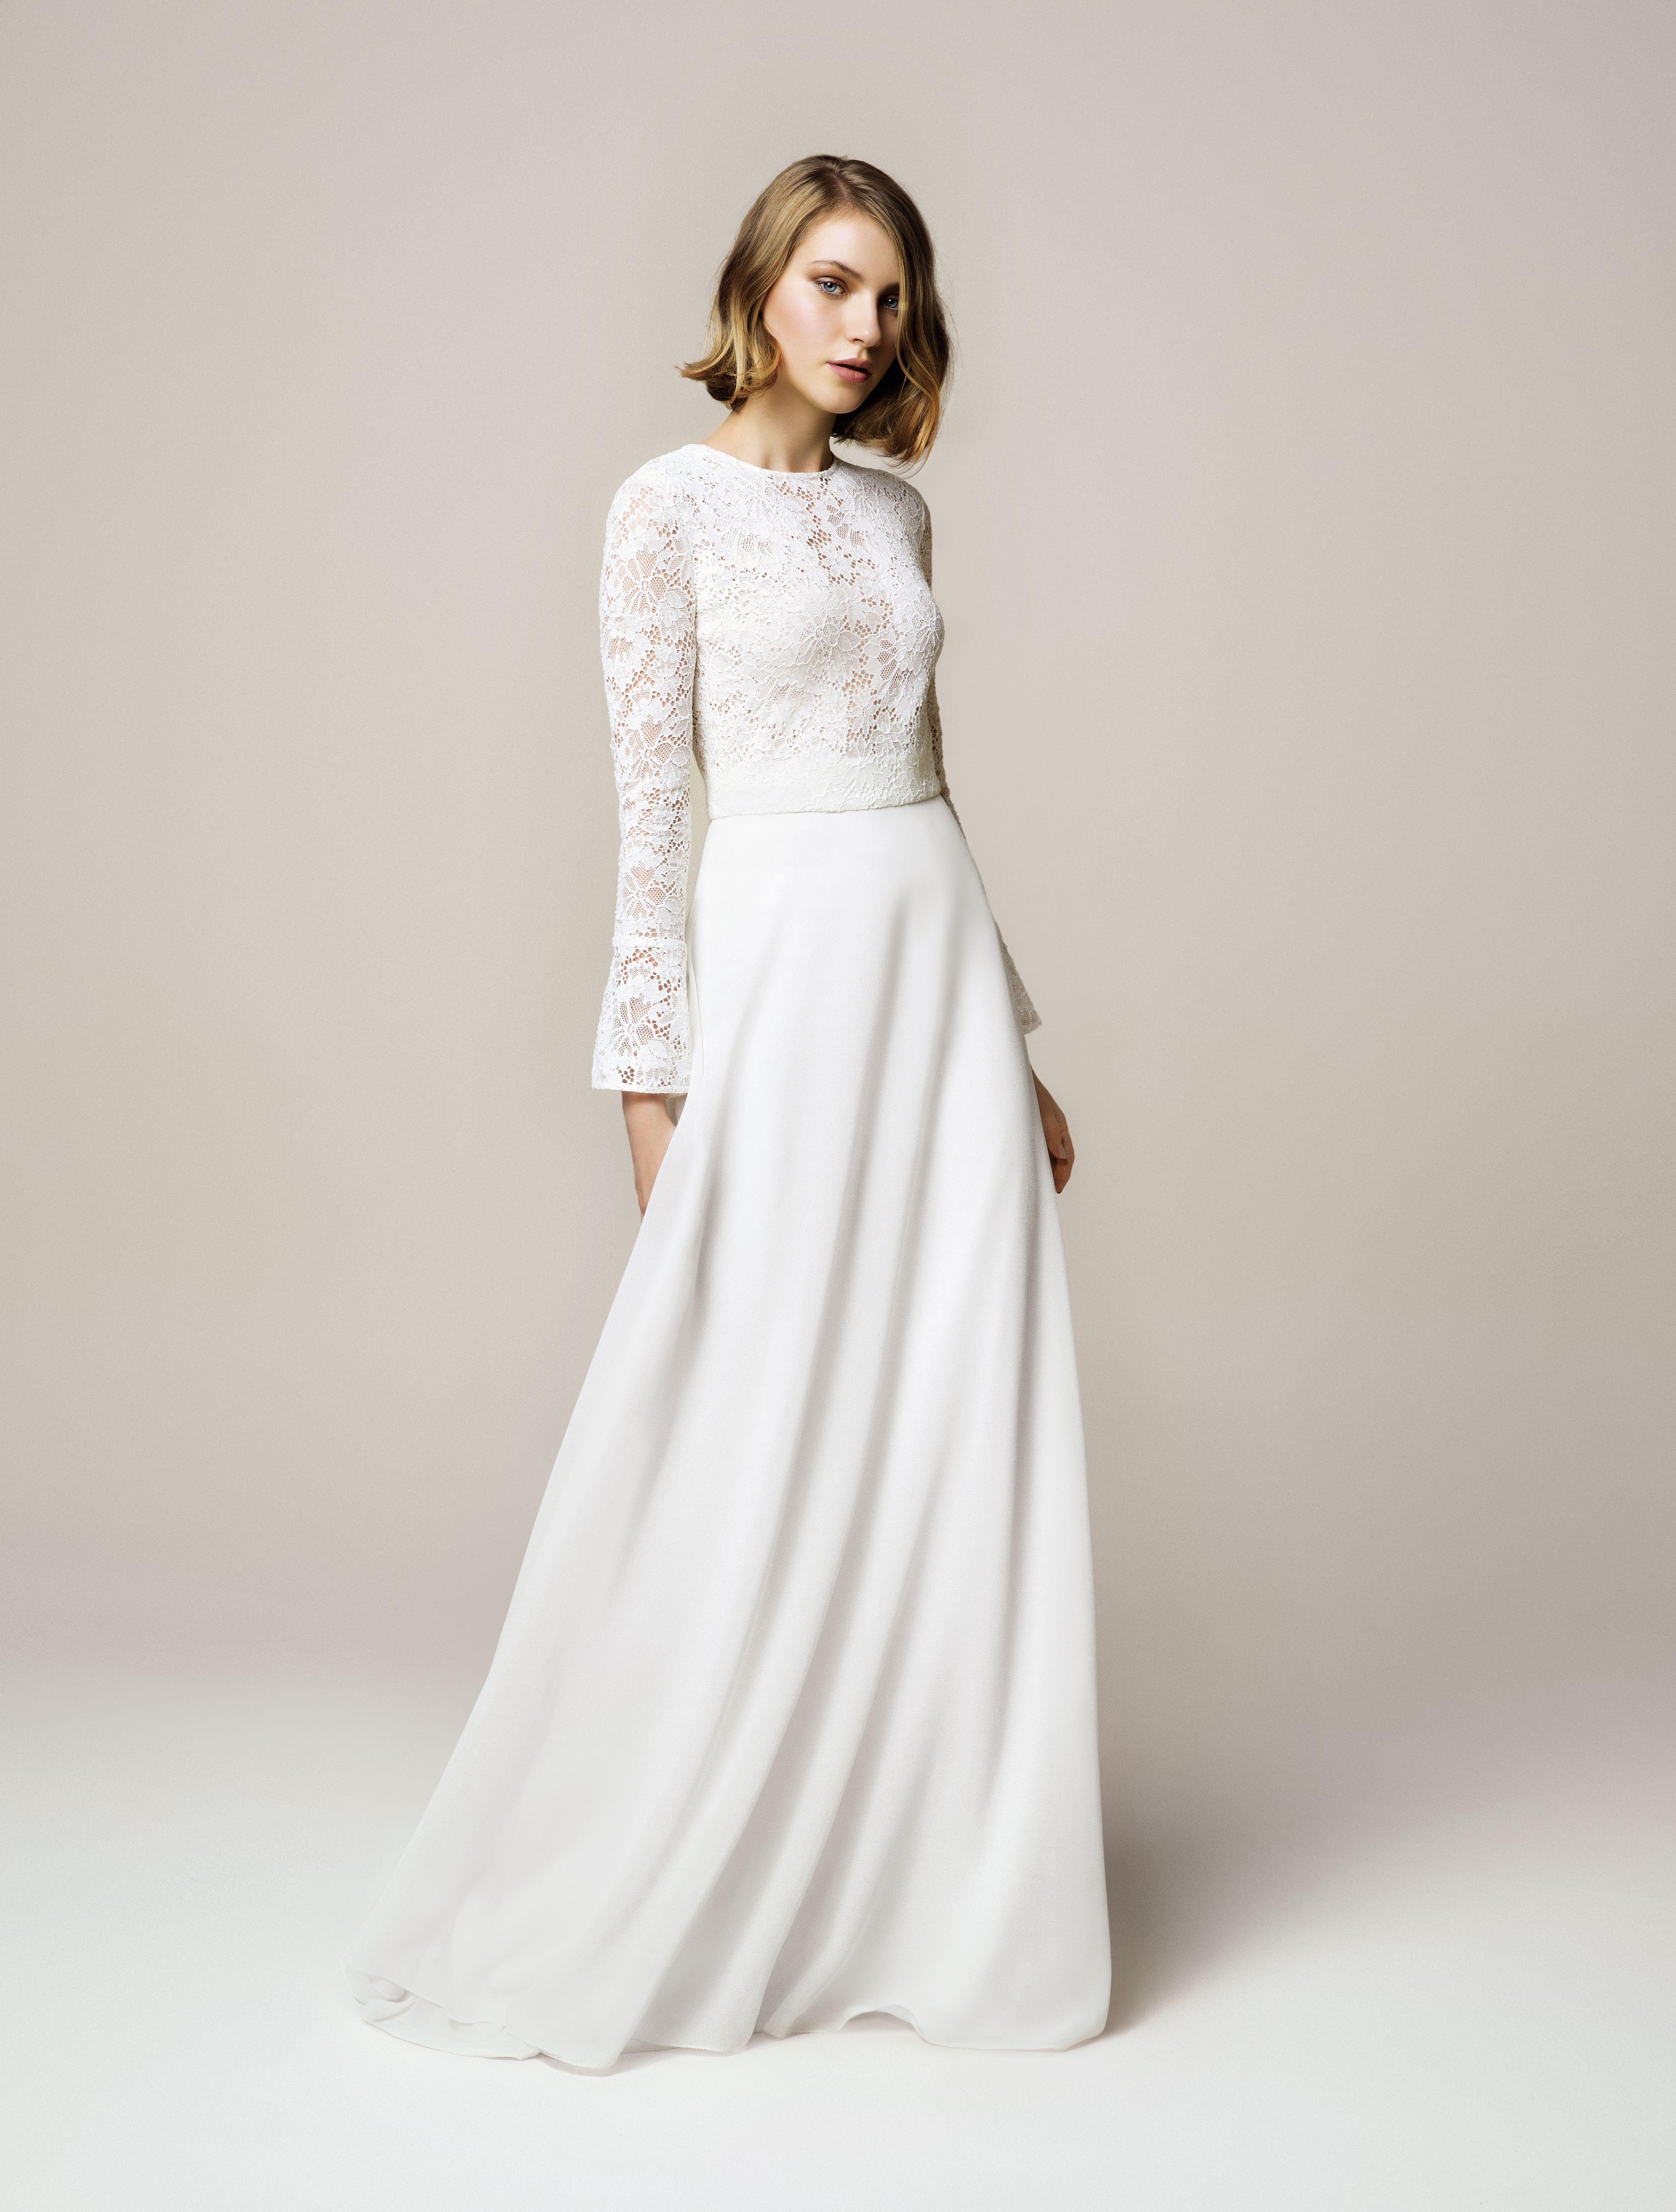 908 Vintage Inspired Wedding Dresses Vintage Style Wedding Dresses Wedding Dresses Vintage